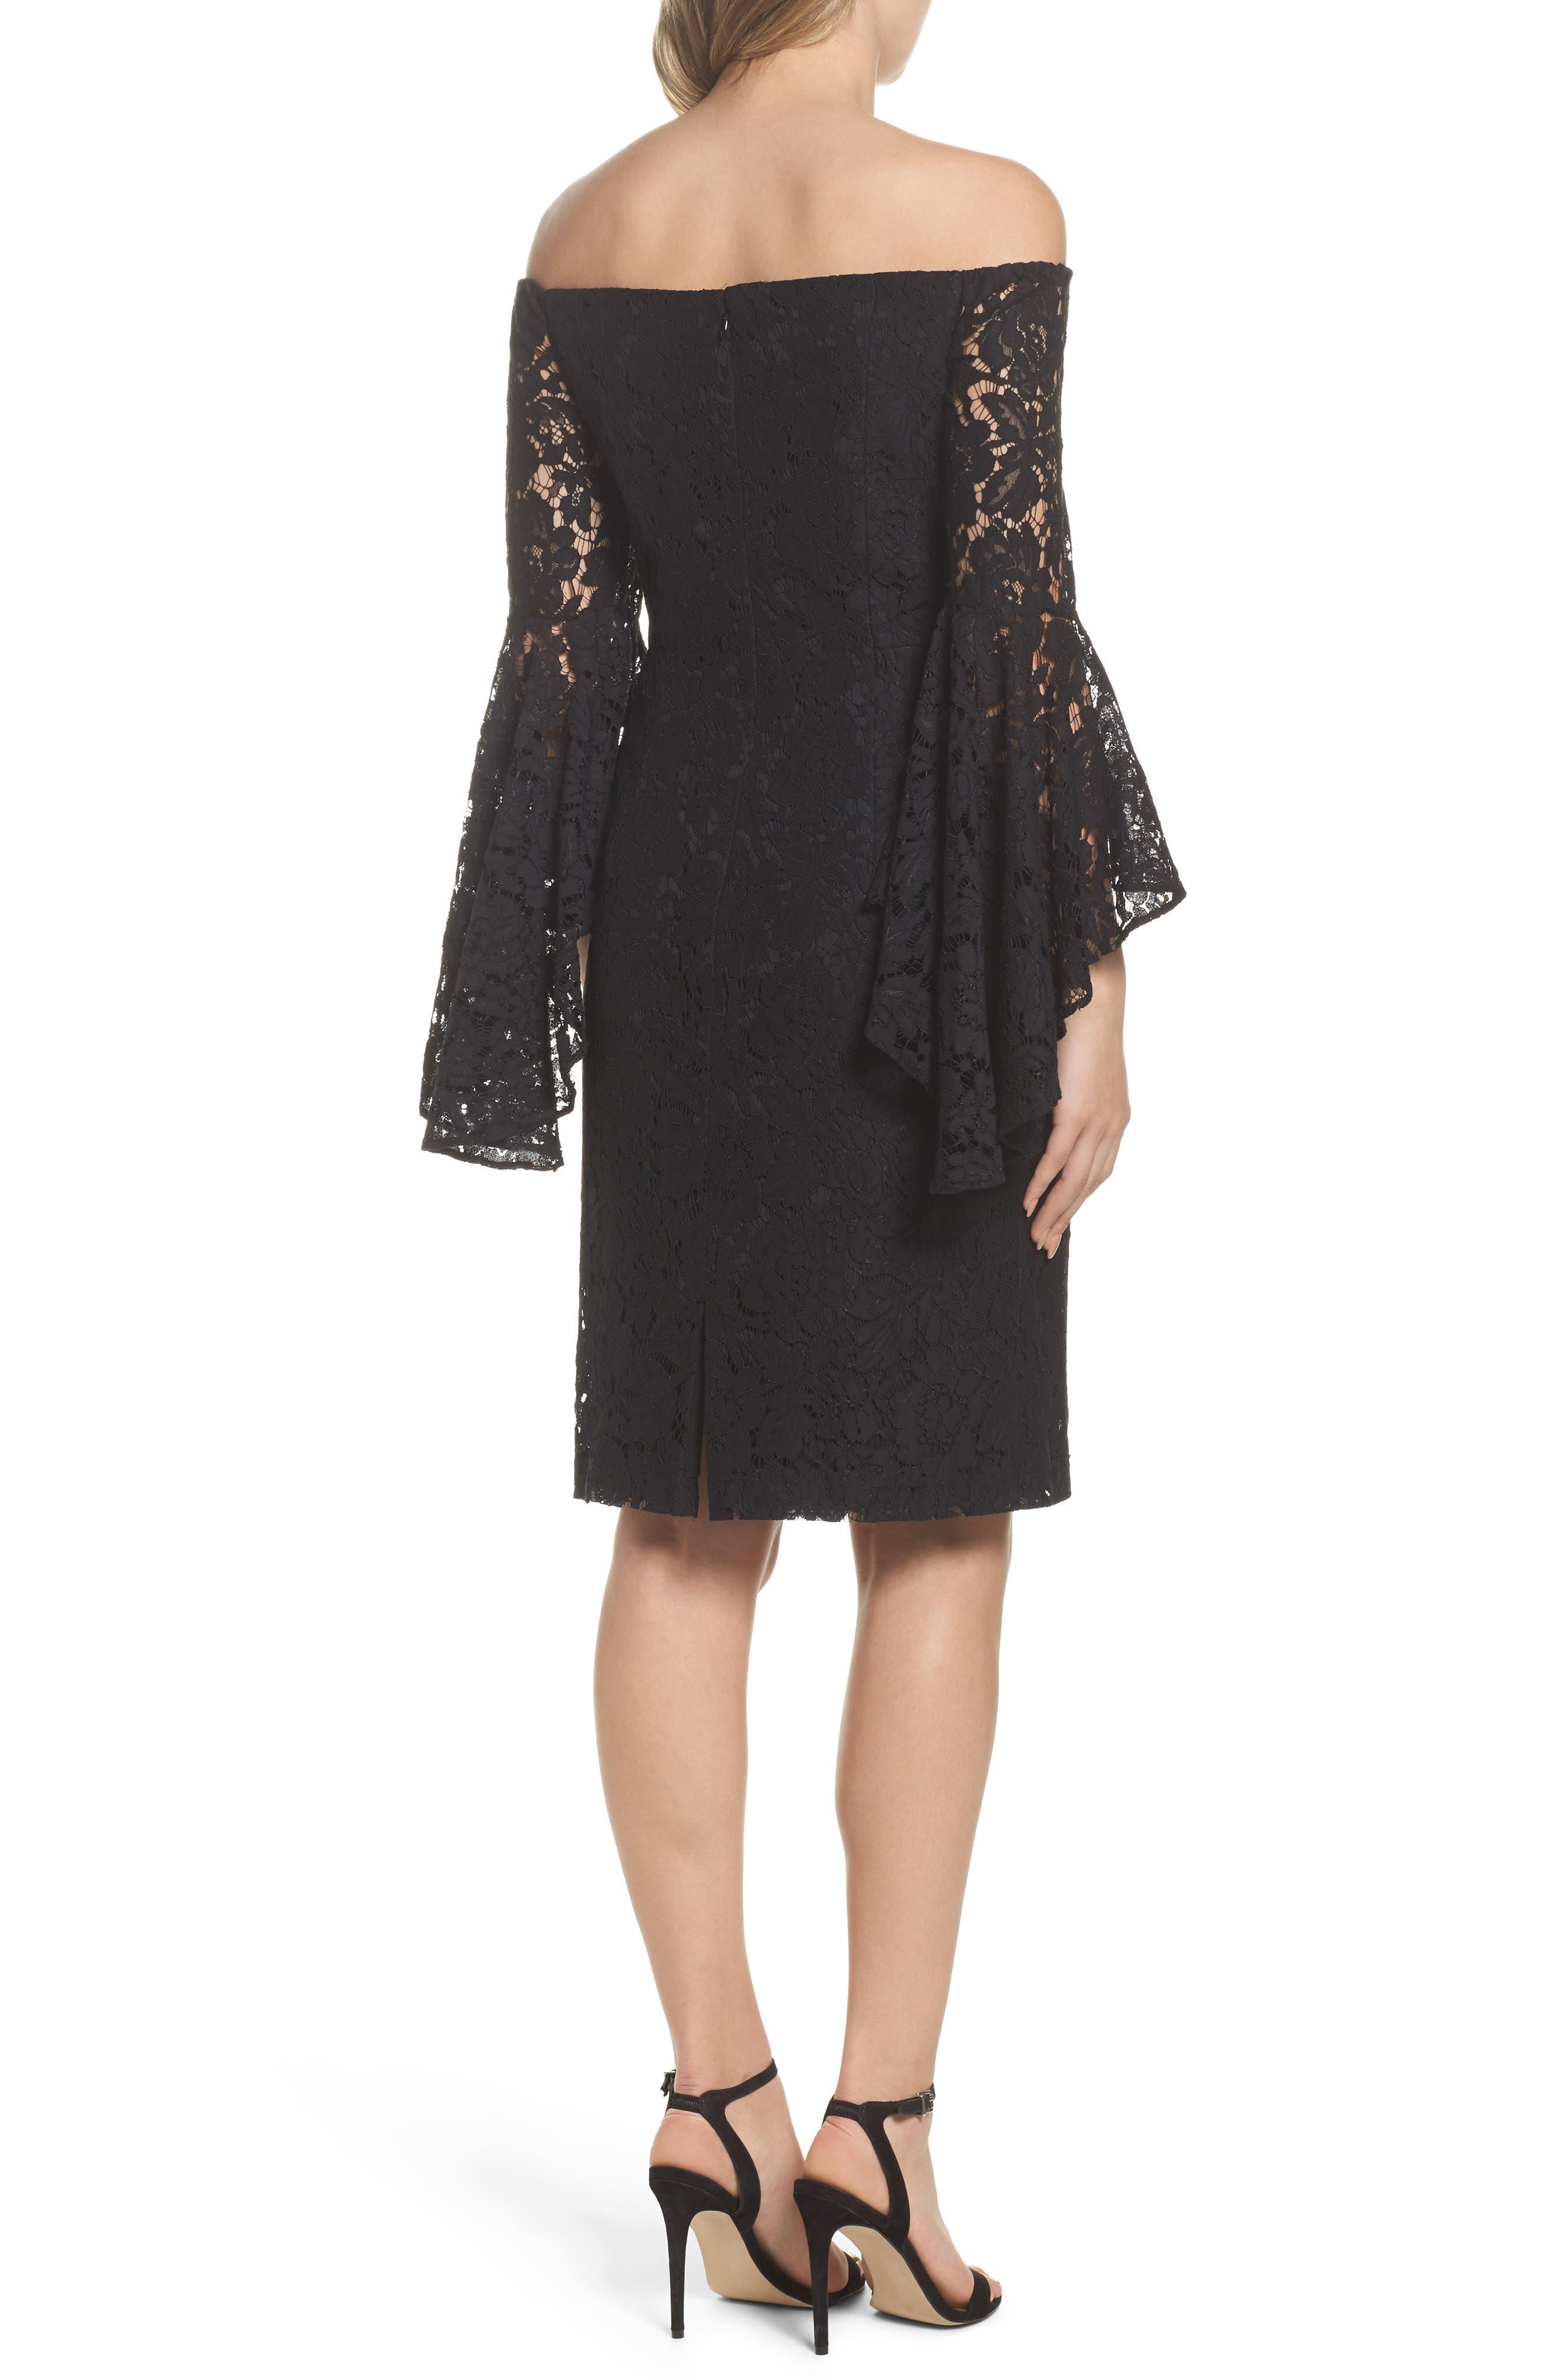 Off the Shoulder Lace Dress,                             Alternate thumbnail 2, color,                             001